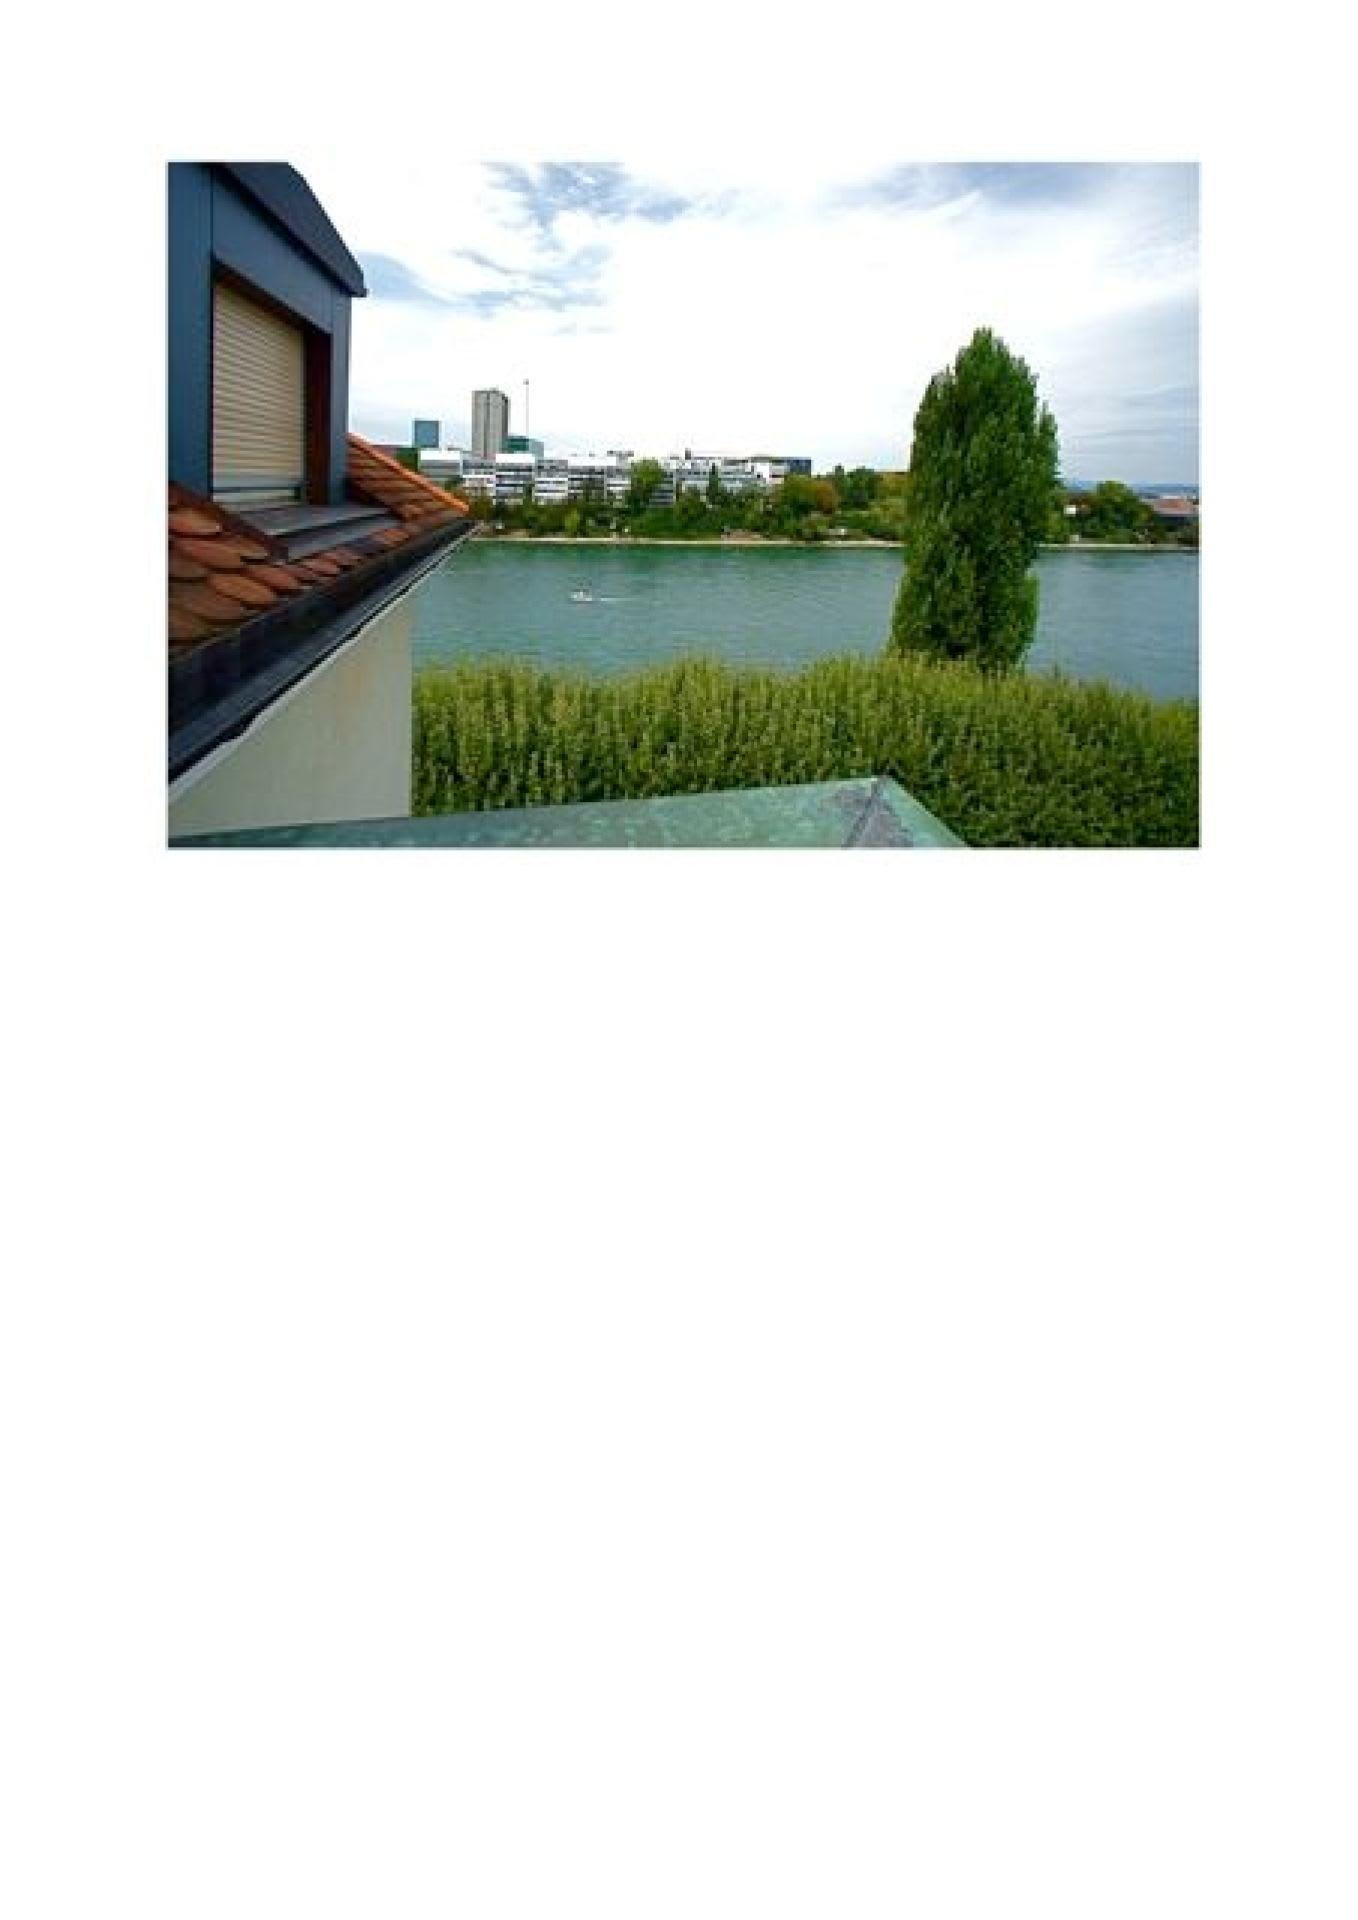 St. Alban-Rheinweg 170